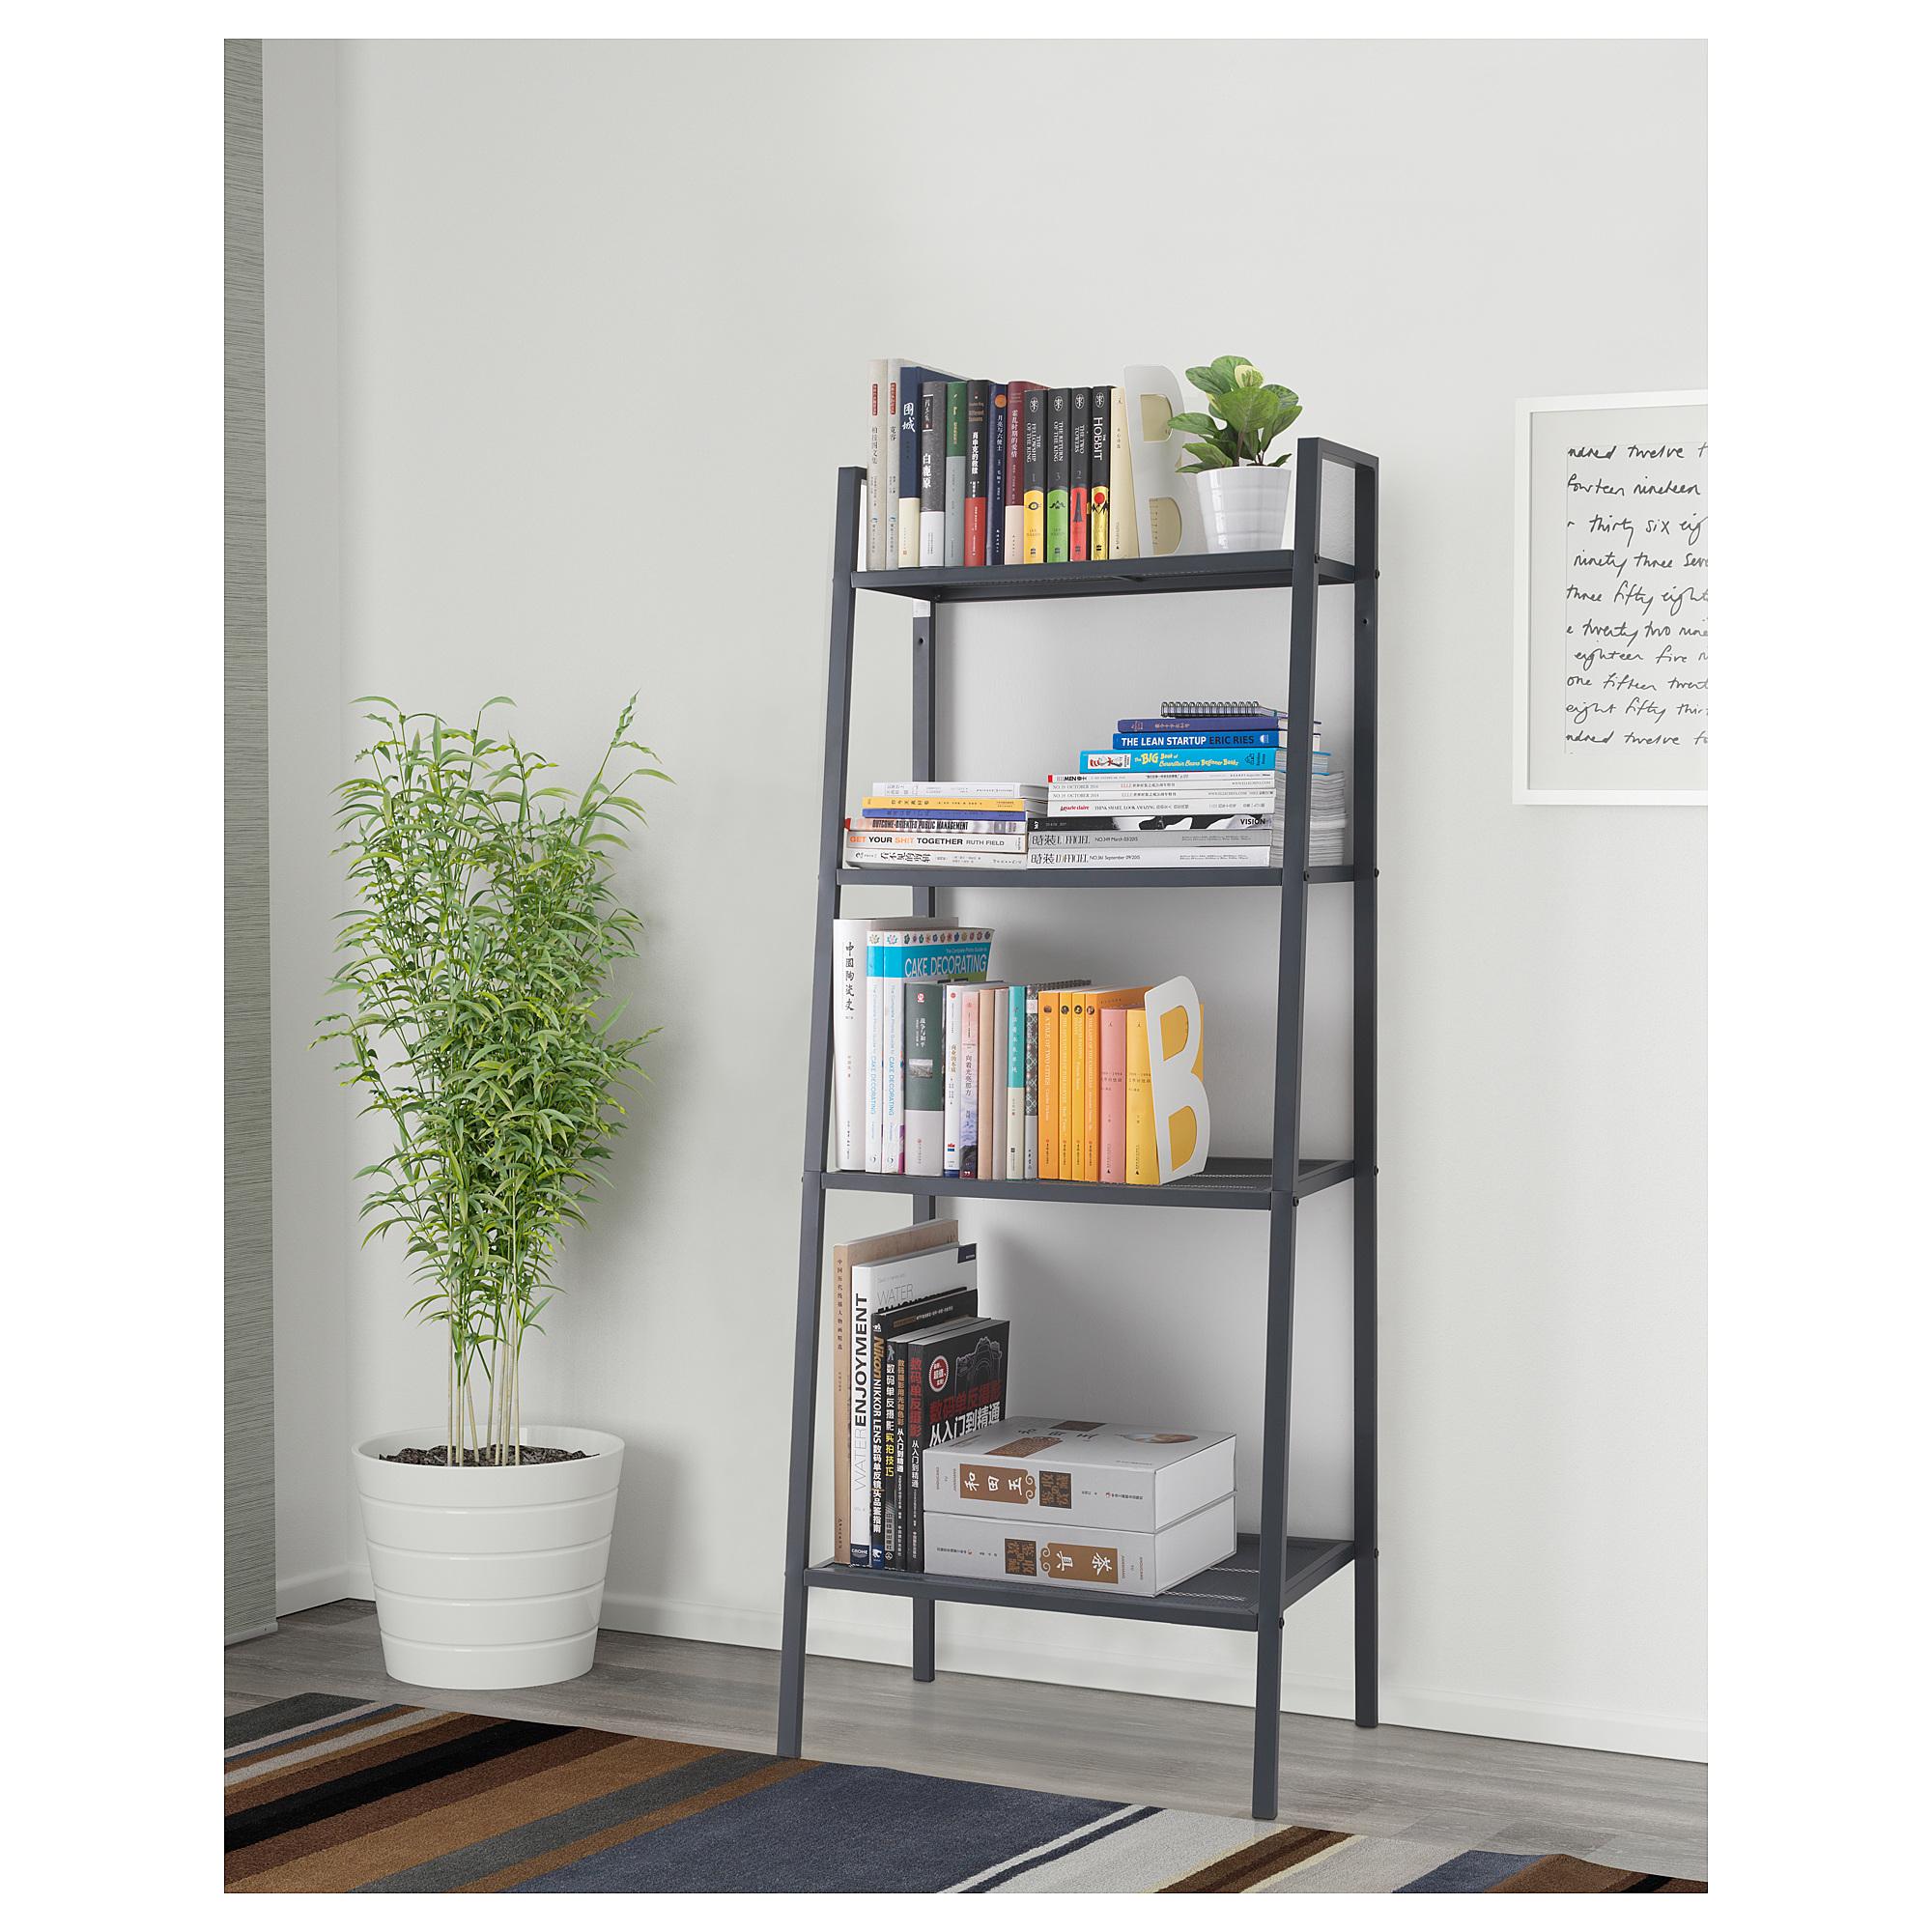 Merveilleux Ikea Genuine Domestic Purchase Lerberg Shelf Cabinets Shelf Racks Kitchen  Storage Shelf Steel Bookshelf Storage Rack